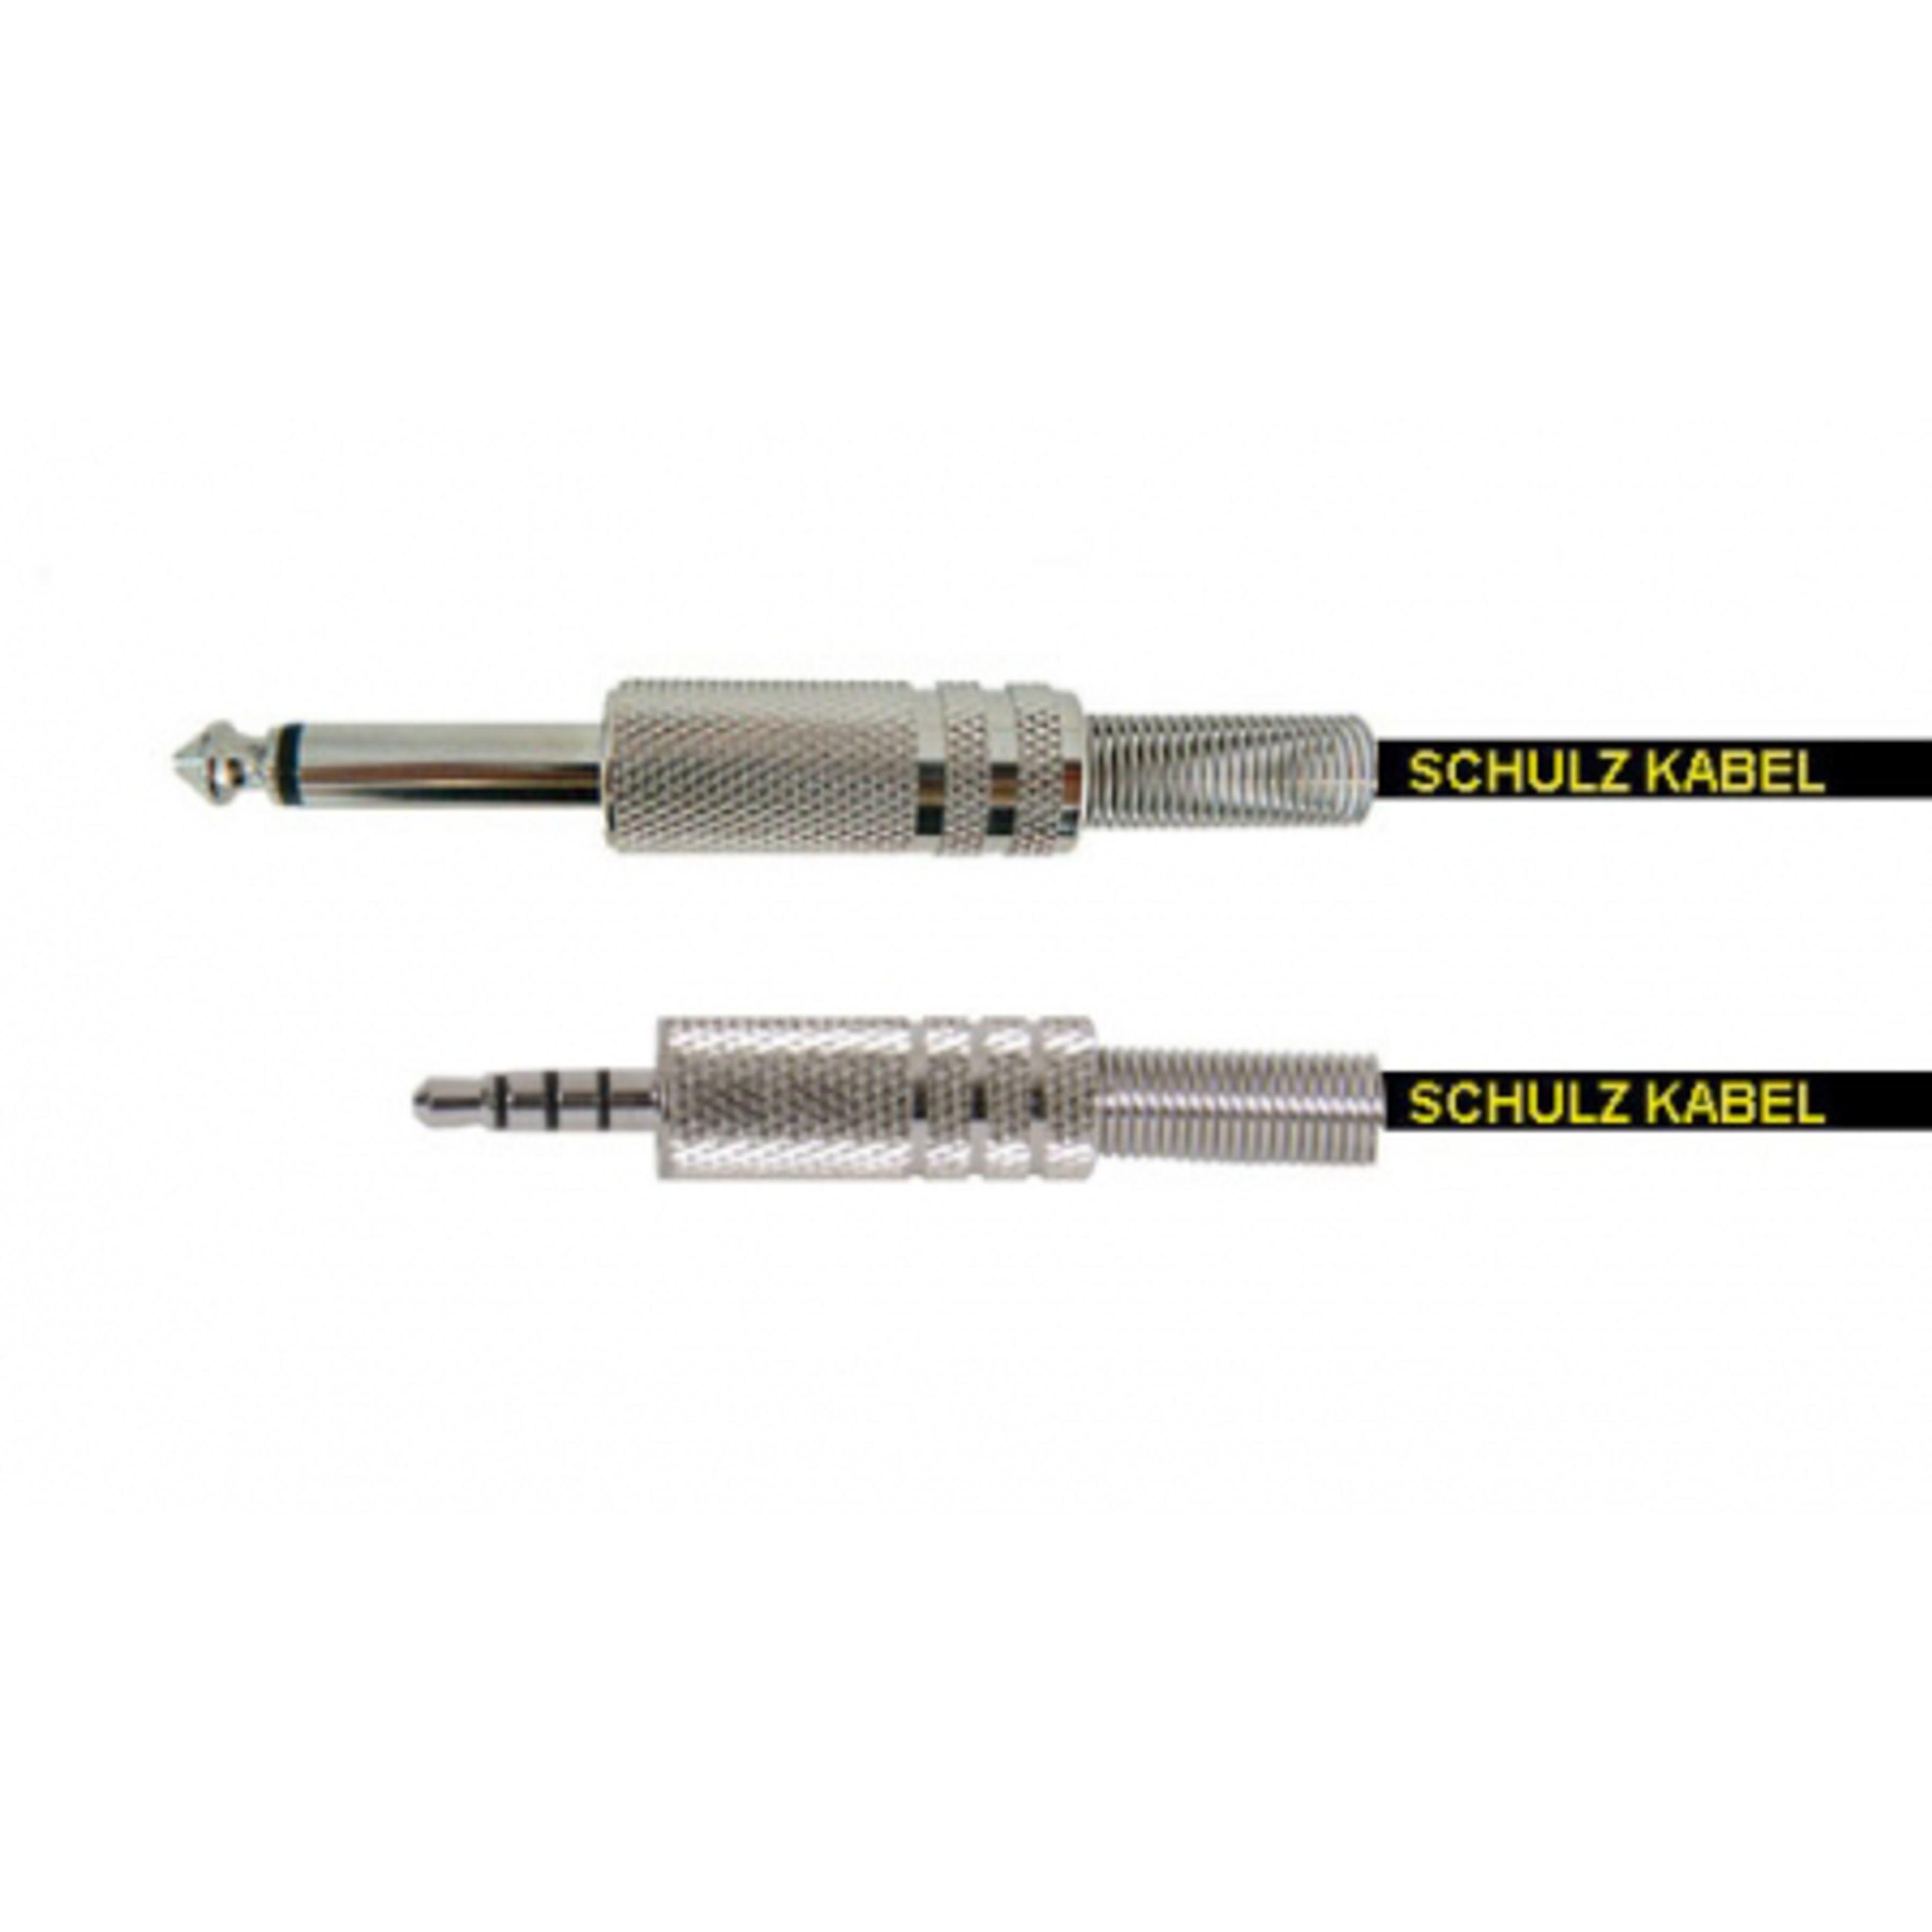 Schulzkabel Cable de instrumento para teléfonos móviles